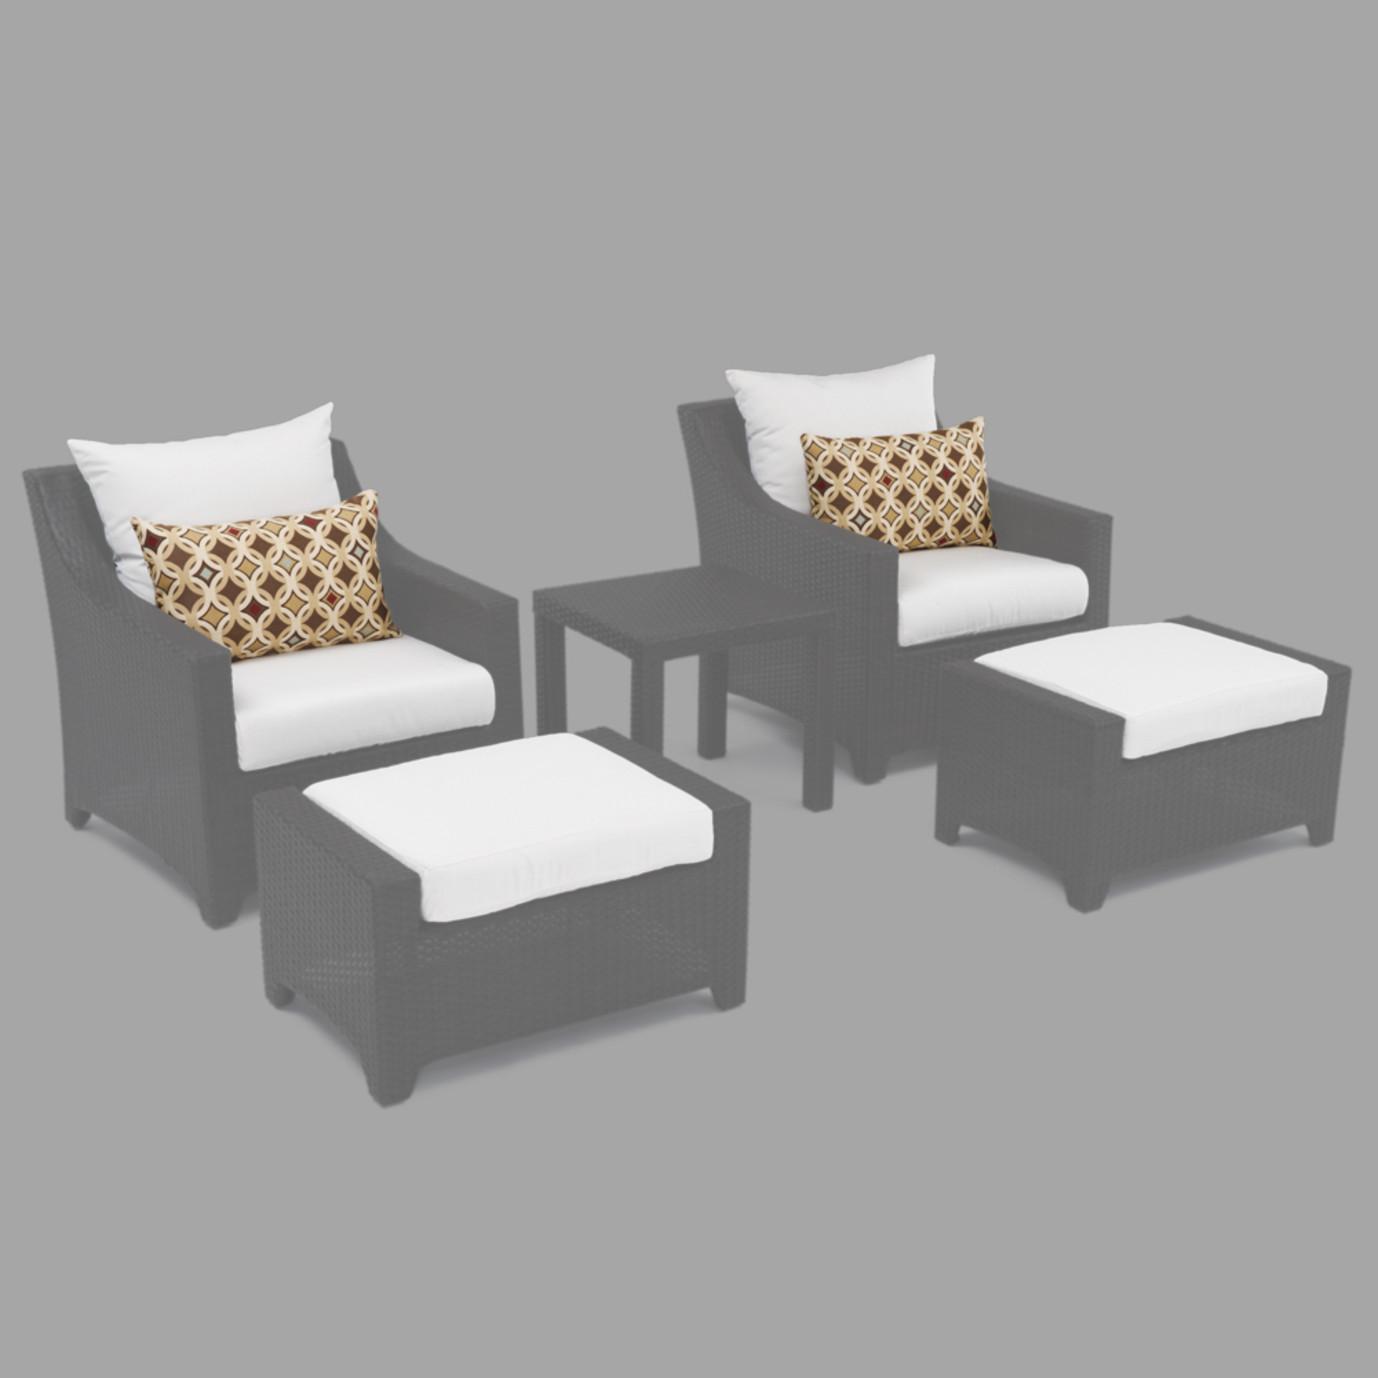 Modular Outdoor 5pc Club Cushion Cover Set - Moroccan Cream